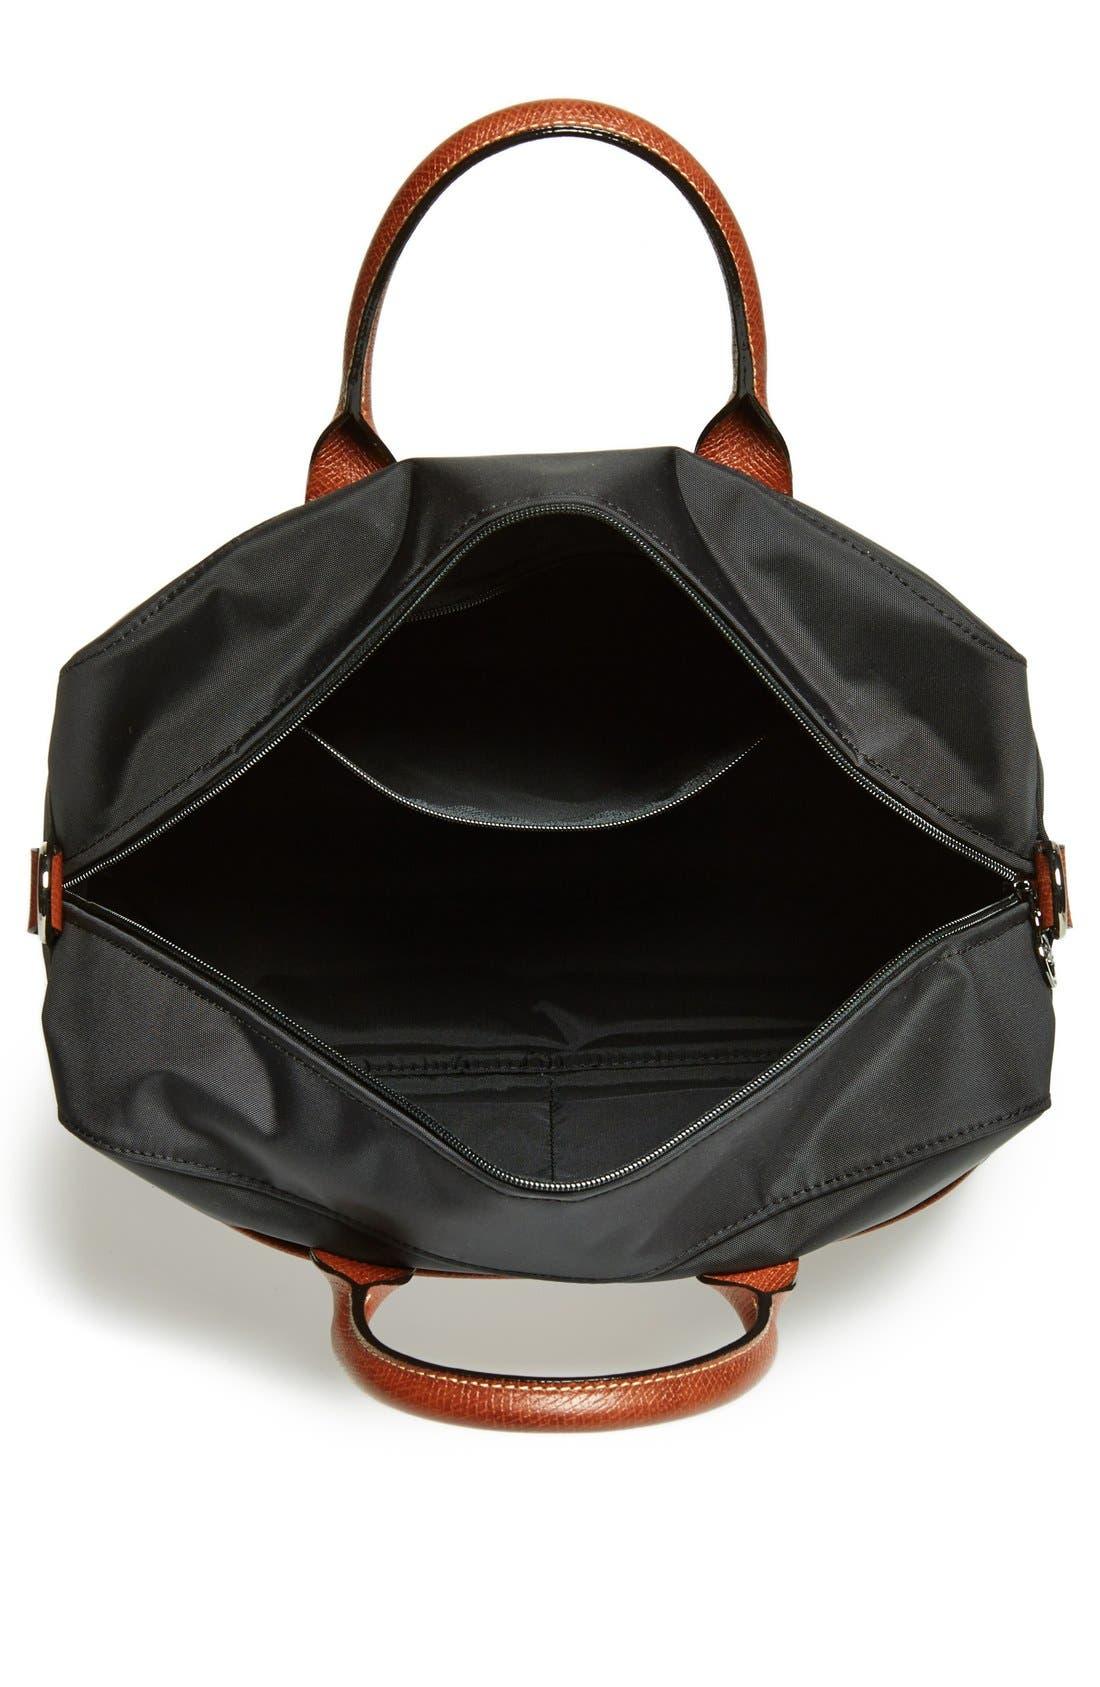 Alternate Image 4  - Longchamp 'Le Pliage' Travel Bag (14 Inch)